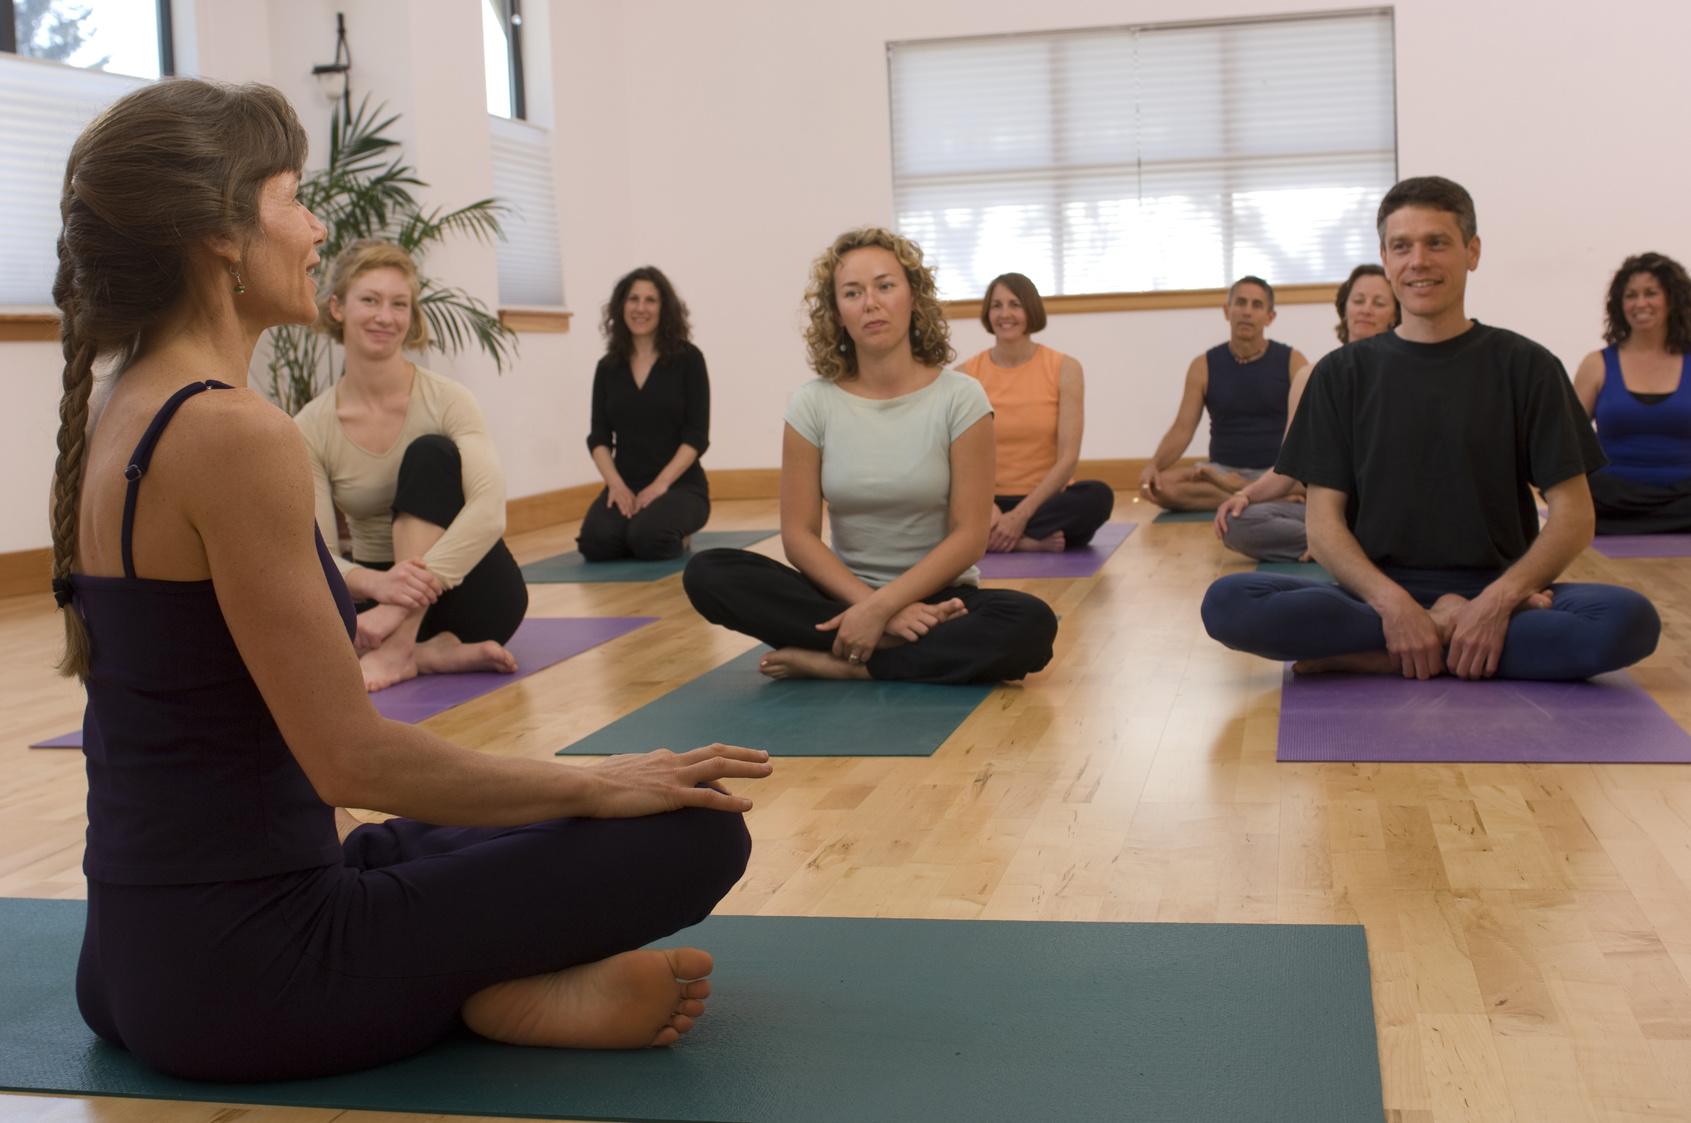 Bildungsurlaub Fur Yoga Kurs Dgb Rechtsschutz Gmbh